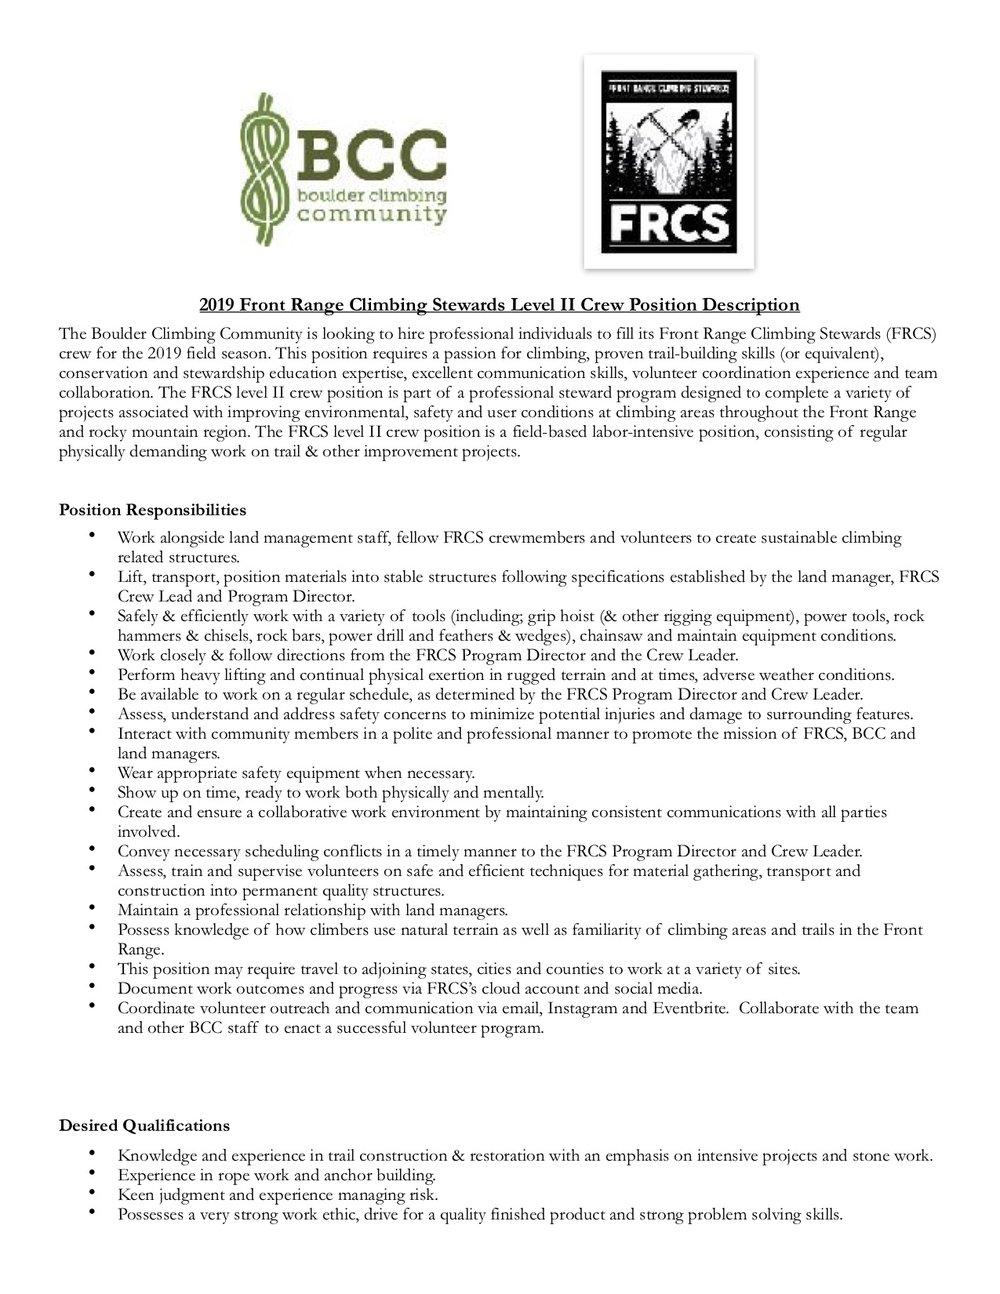 2019 FRCS Level II crew position description.jpg